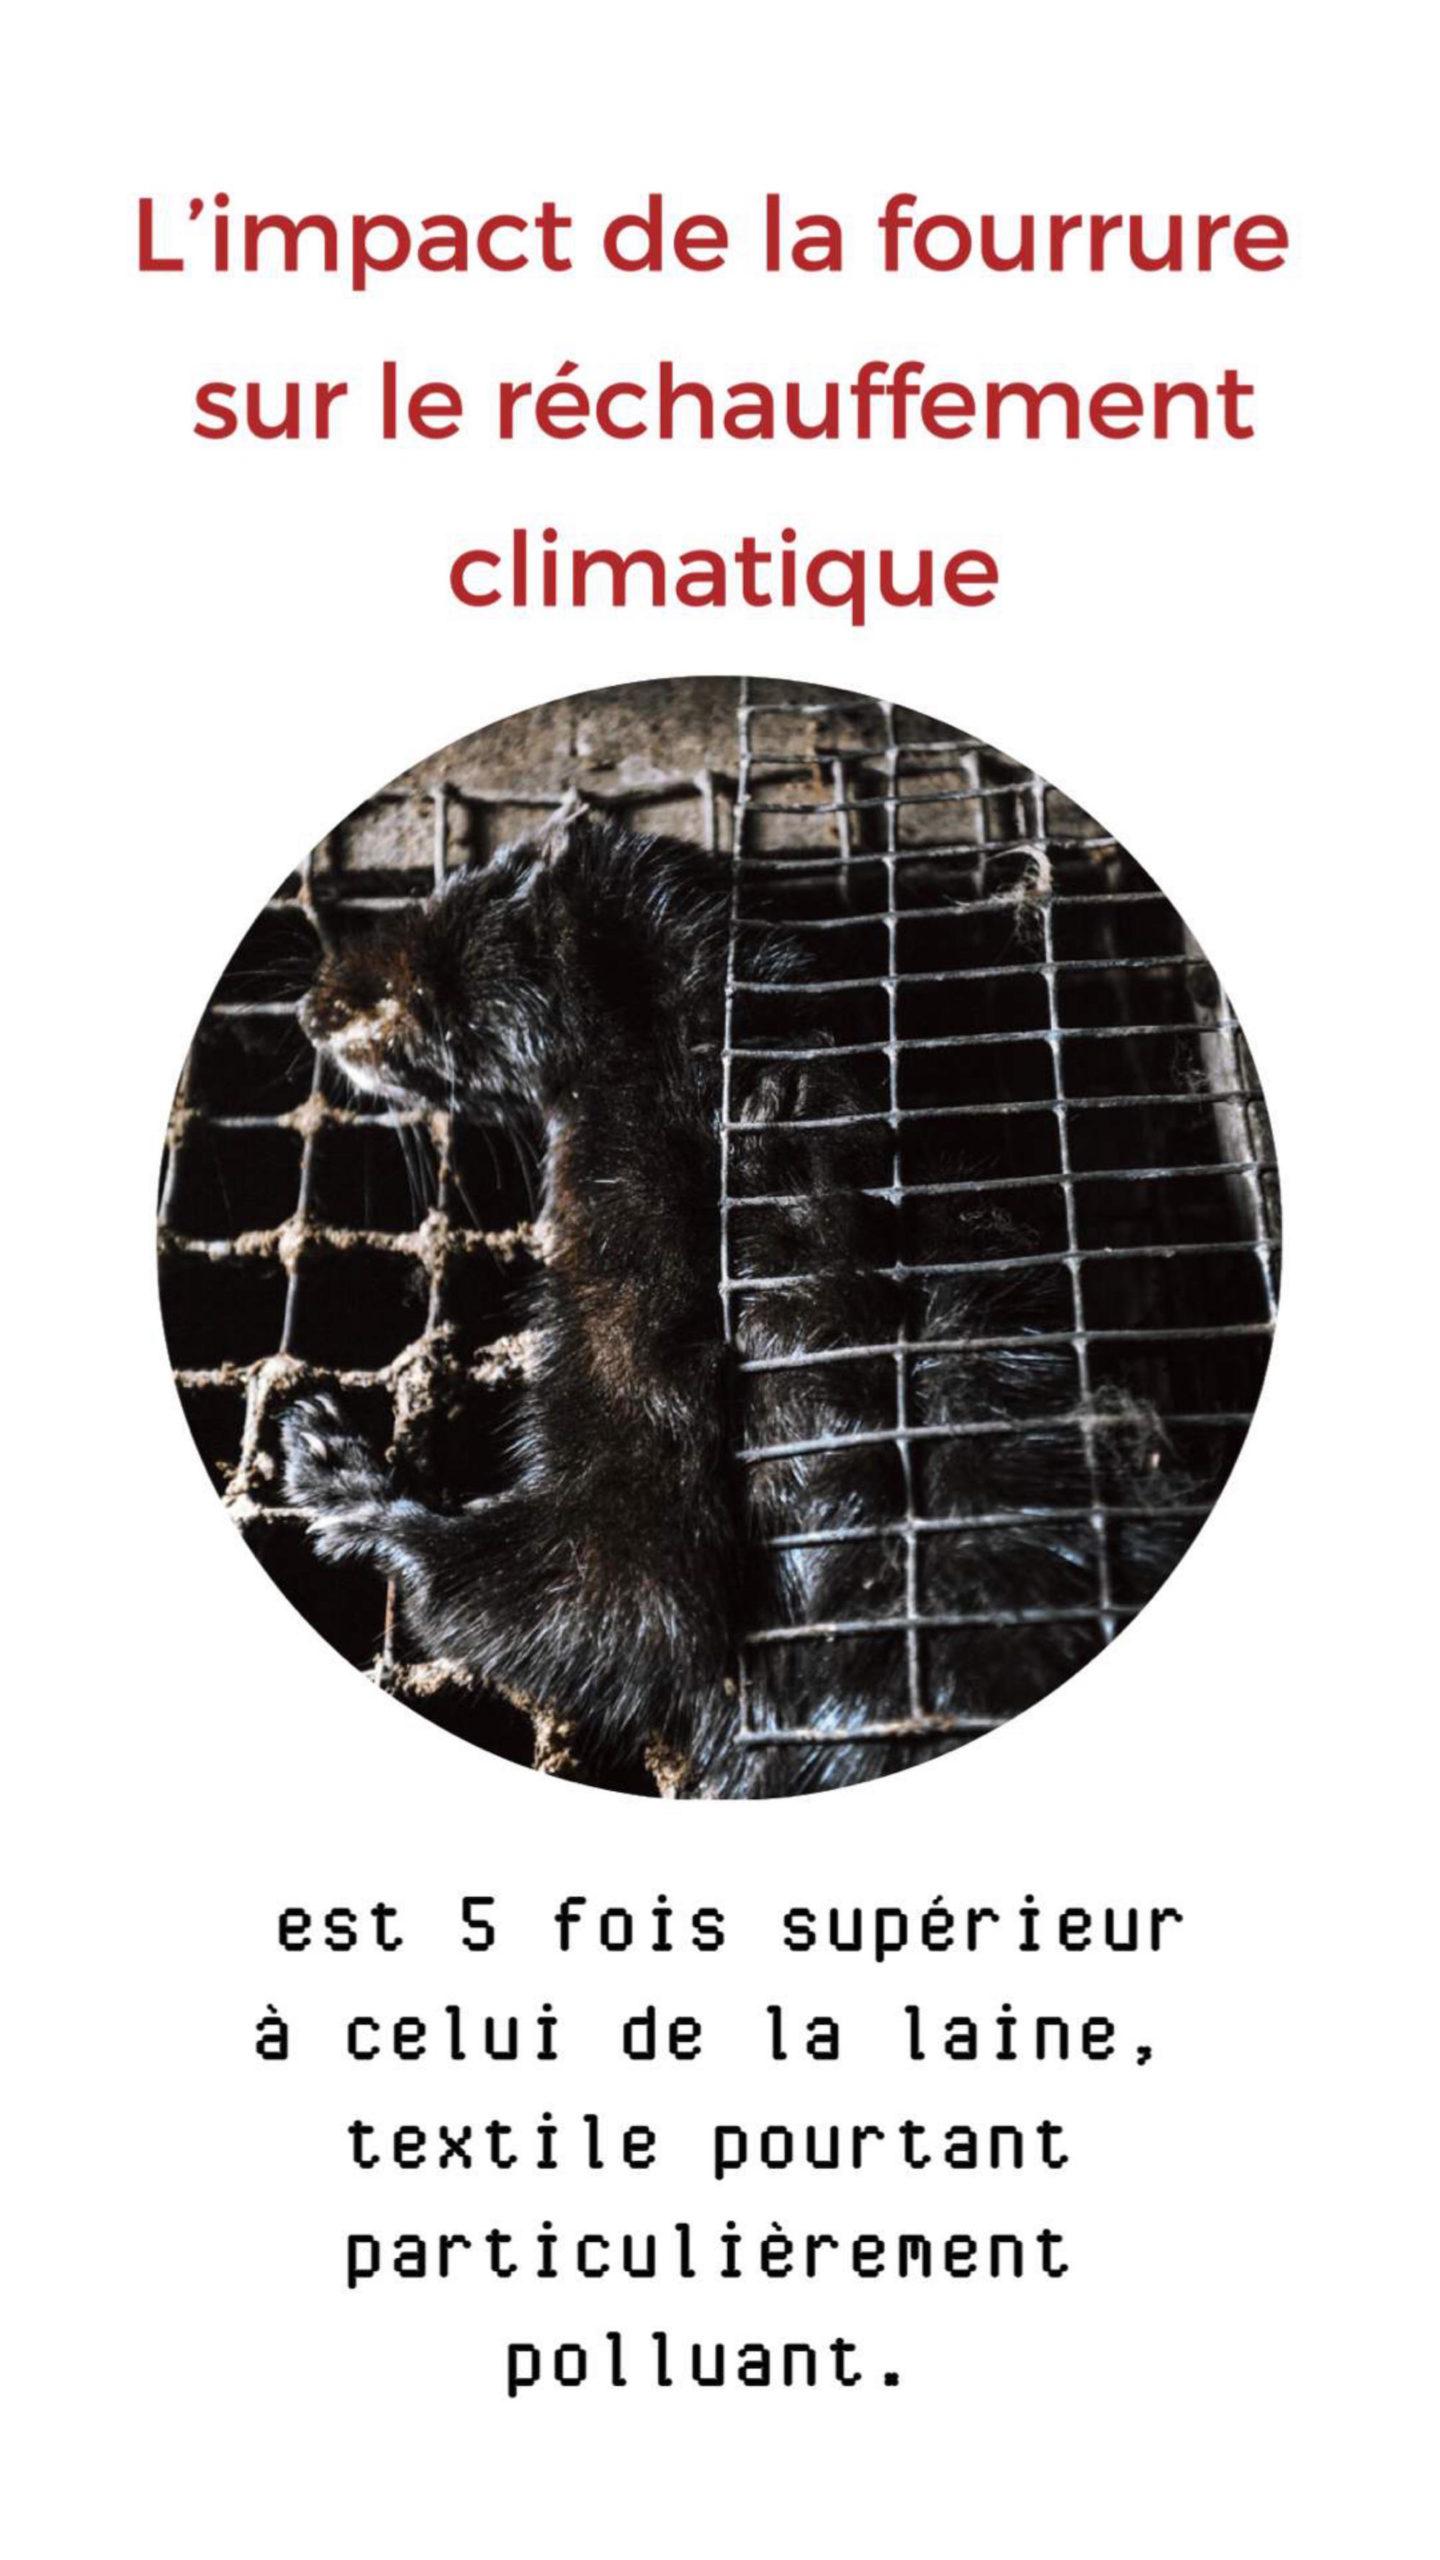 CATALOGUE-CAMPAGNE-ANTI-FOURRURE-page-8